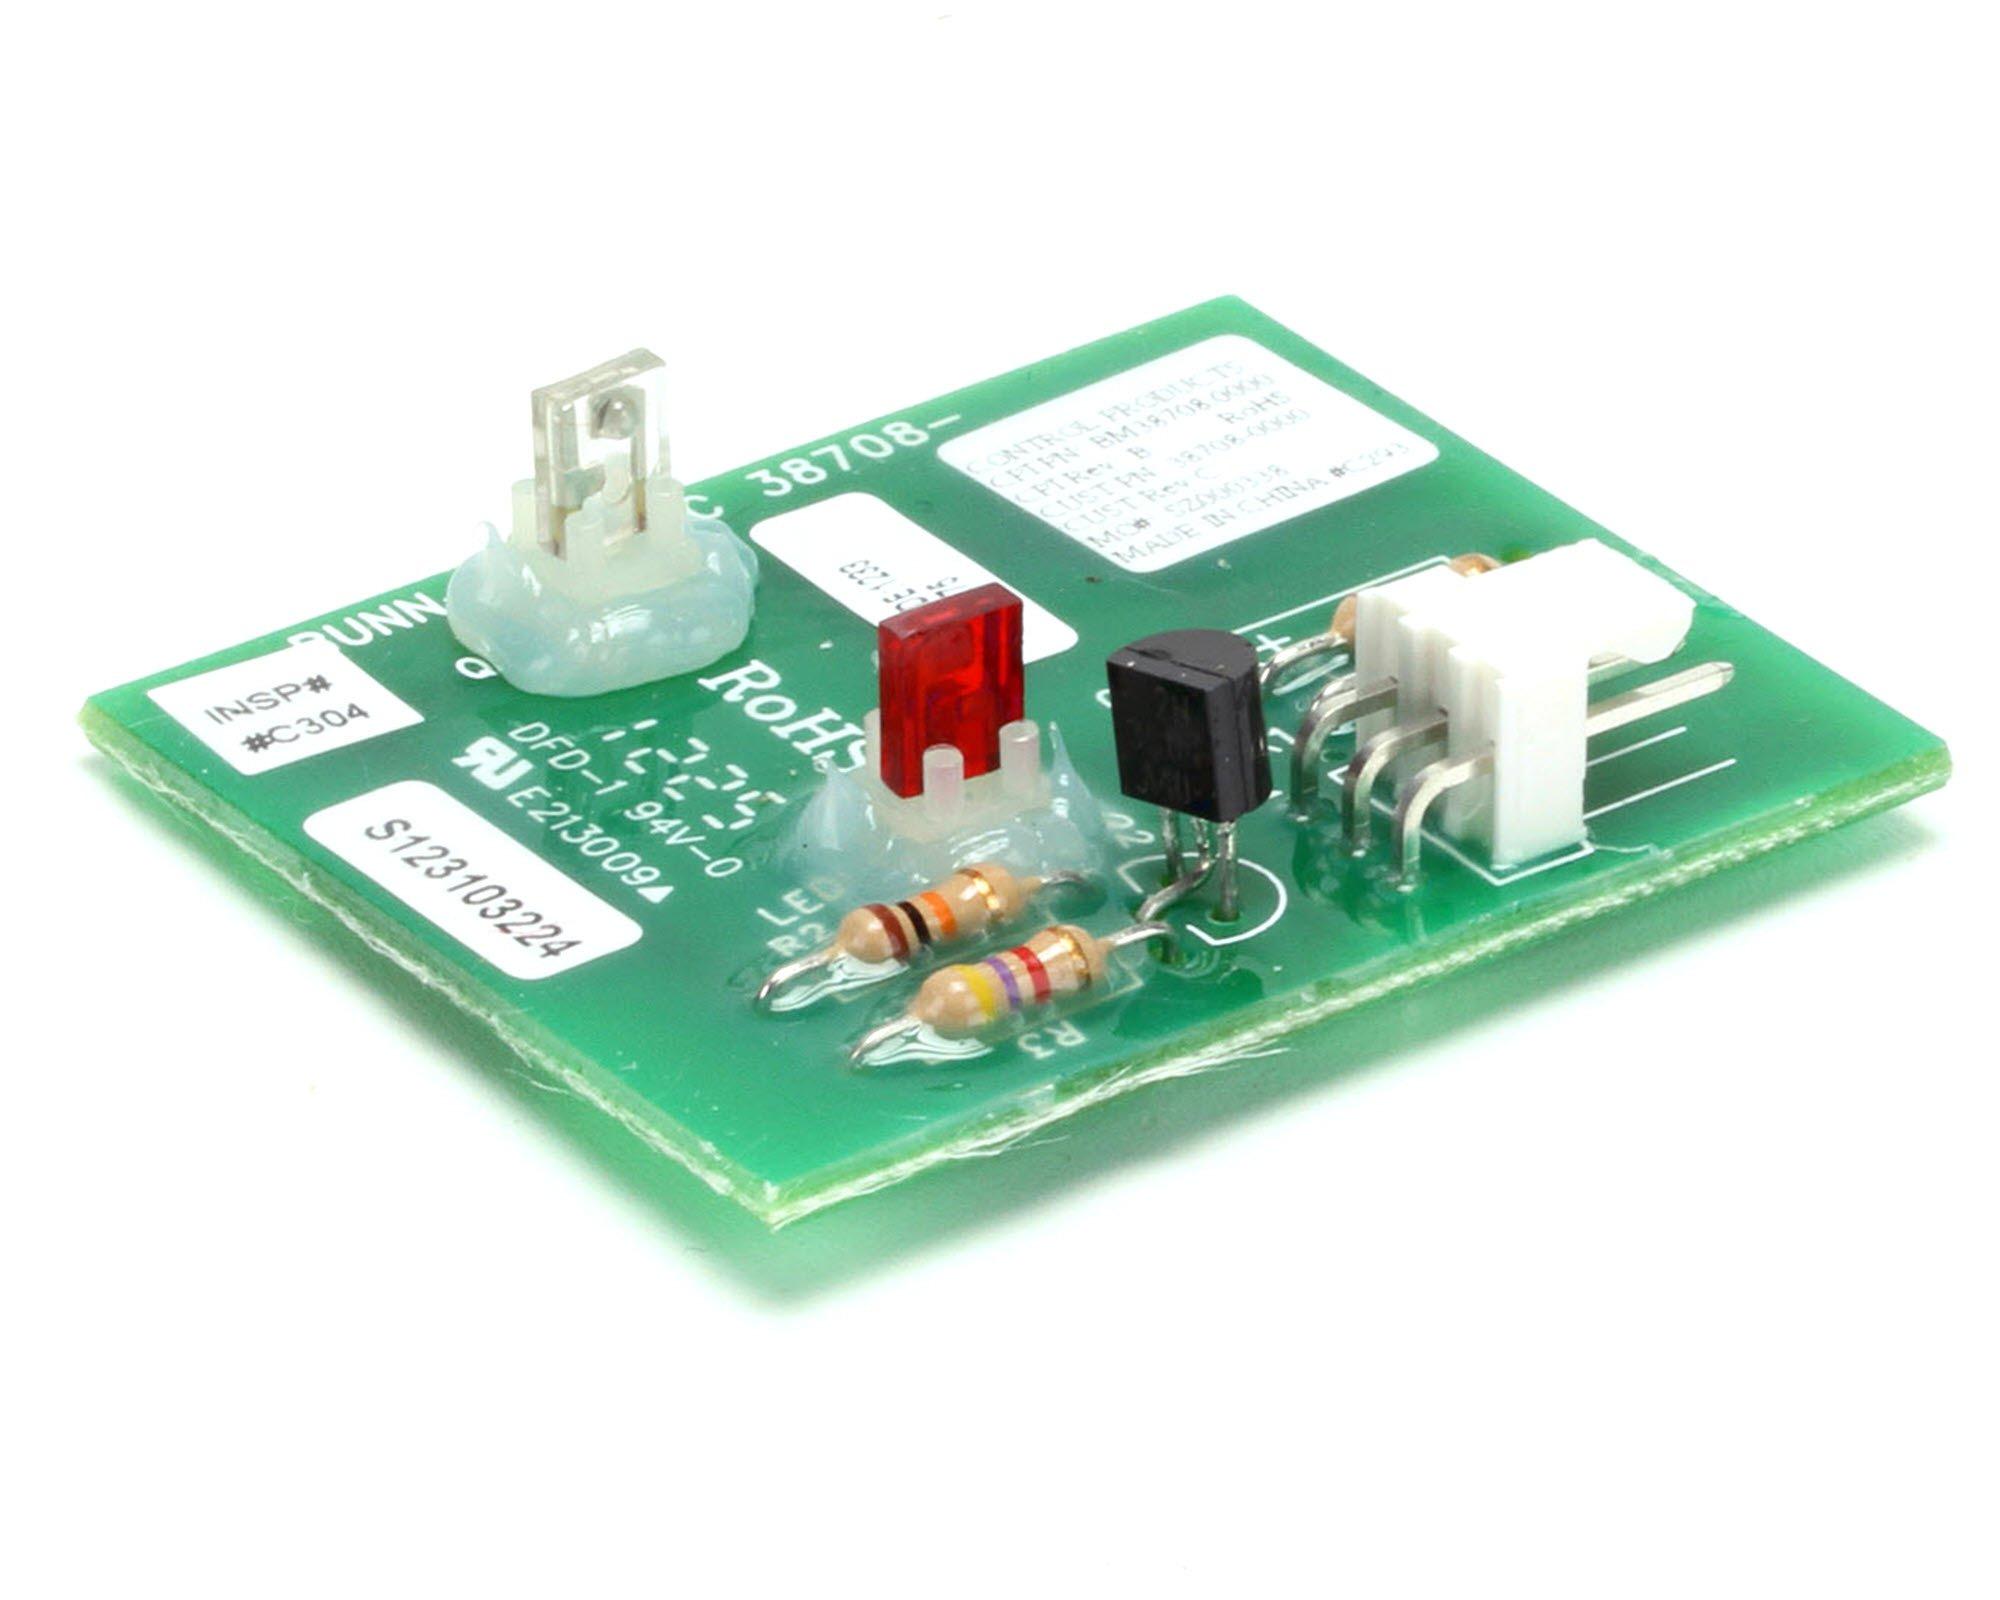 Bunn 38708.1 Position Sensor Control Board Assembly Kit